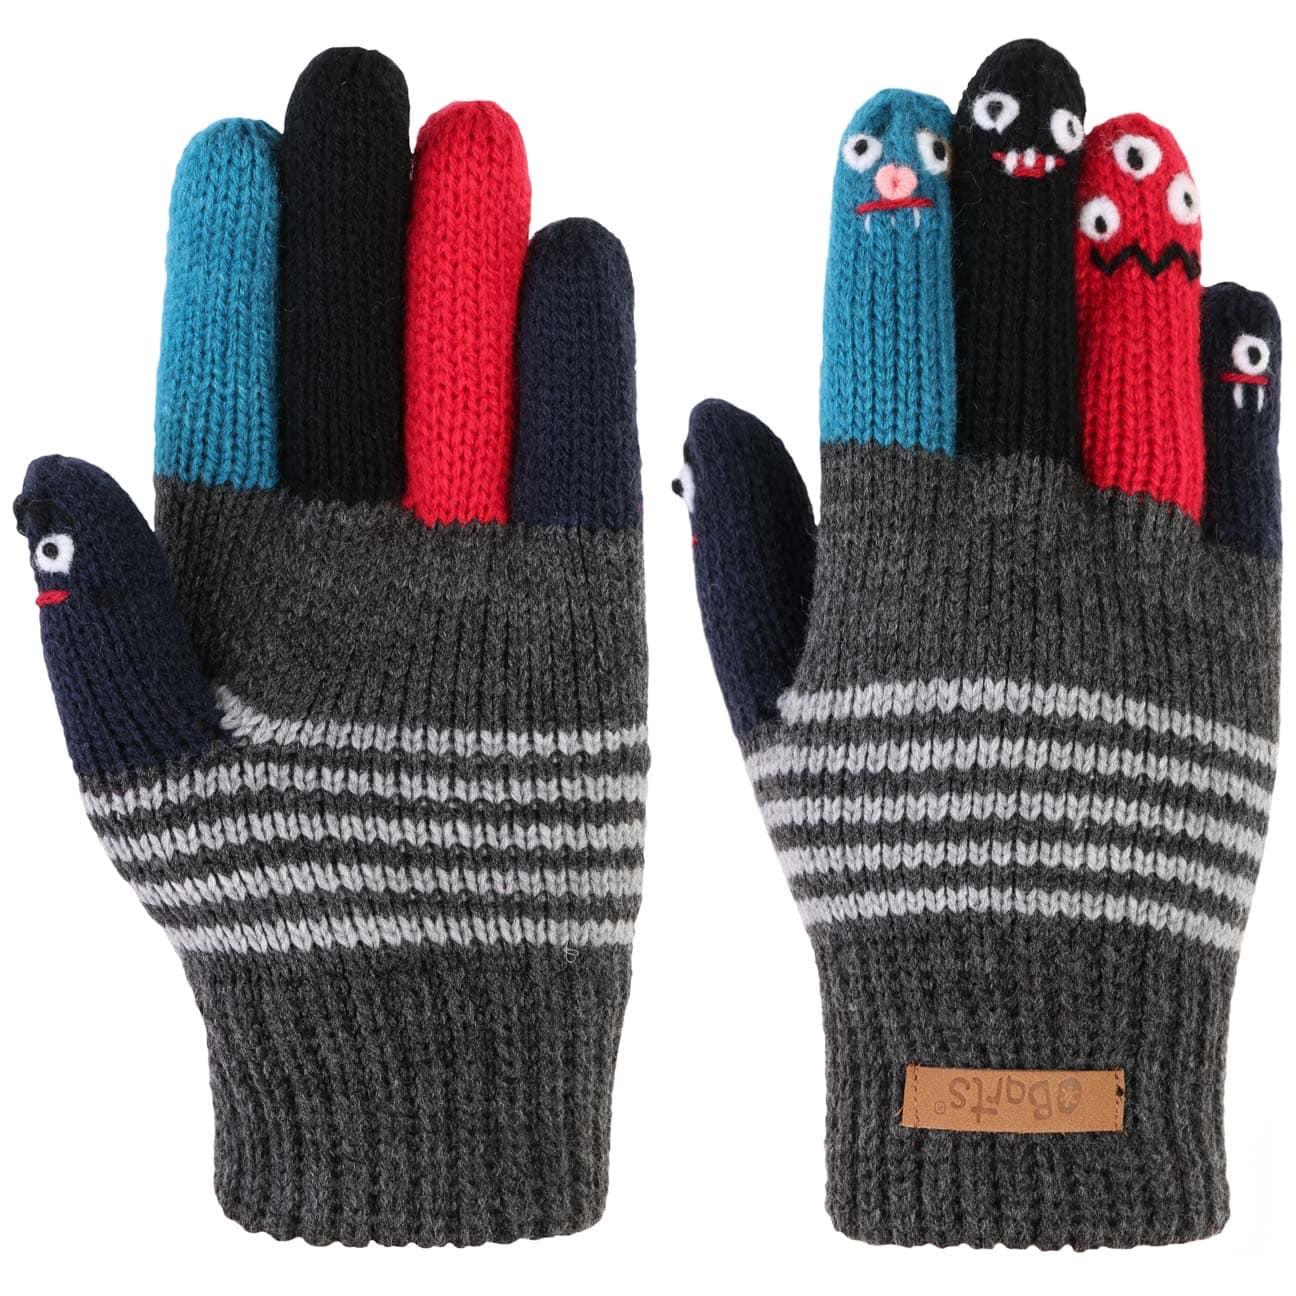 Guantes de Ni?o Puppet by Barts  guantes de punto